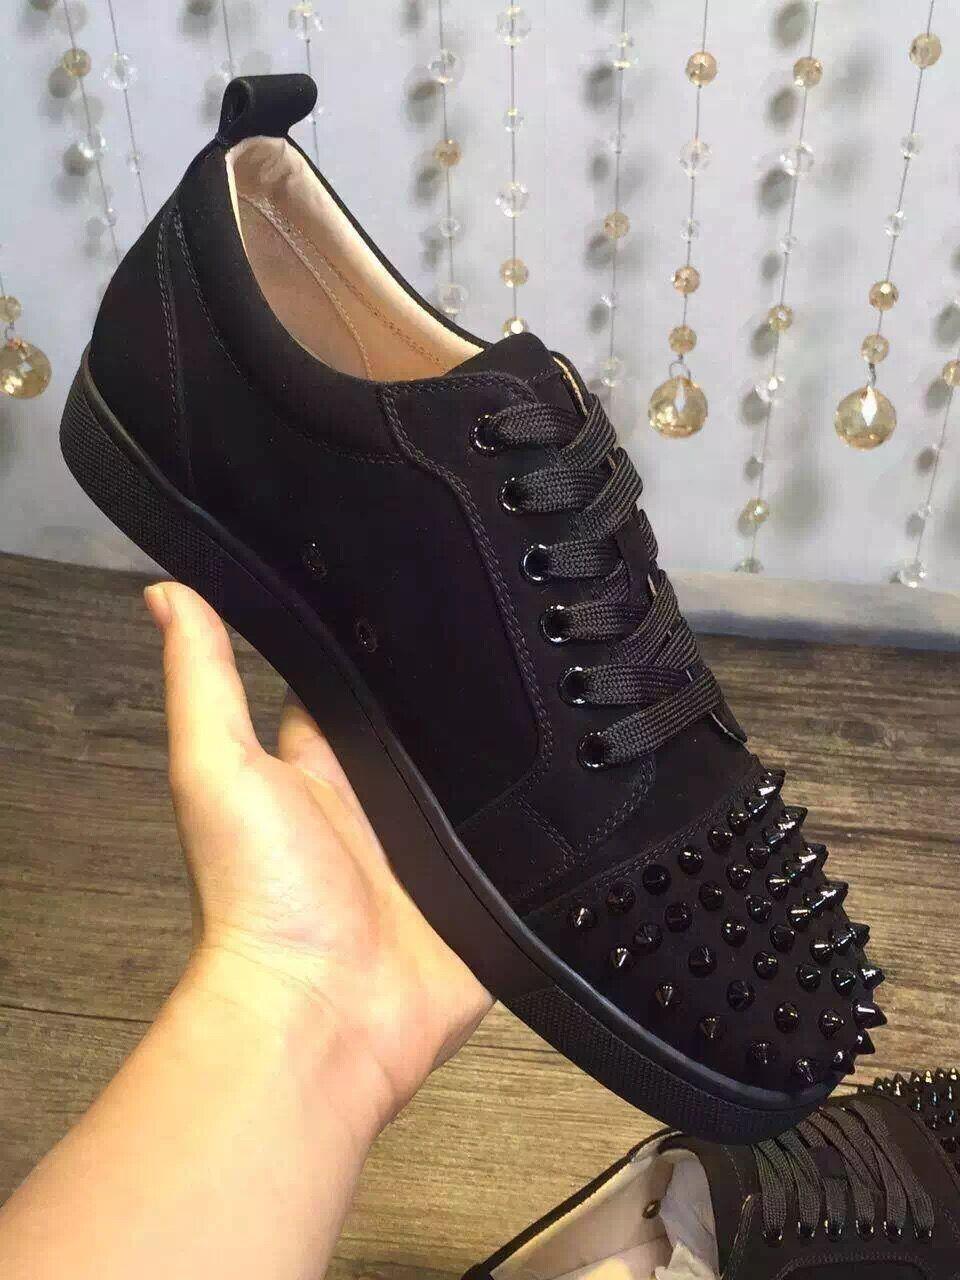 aliexpress louboutin shoes homme